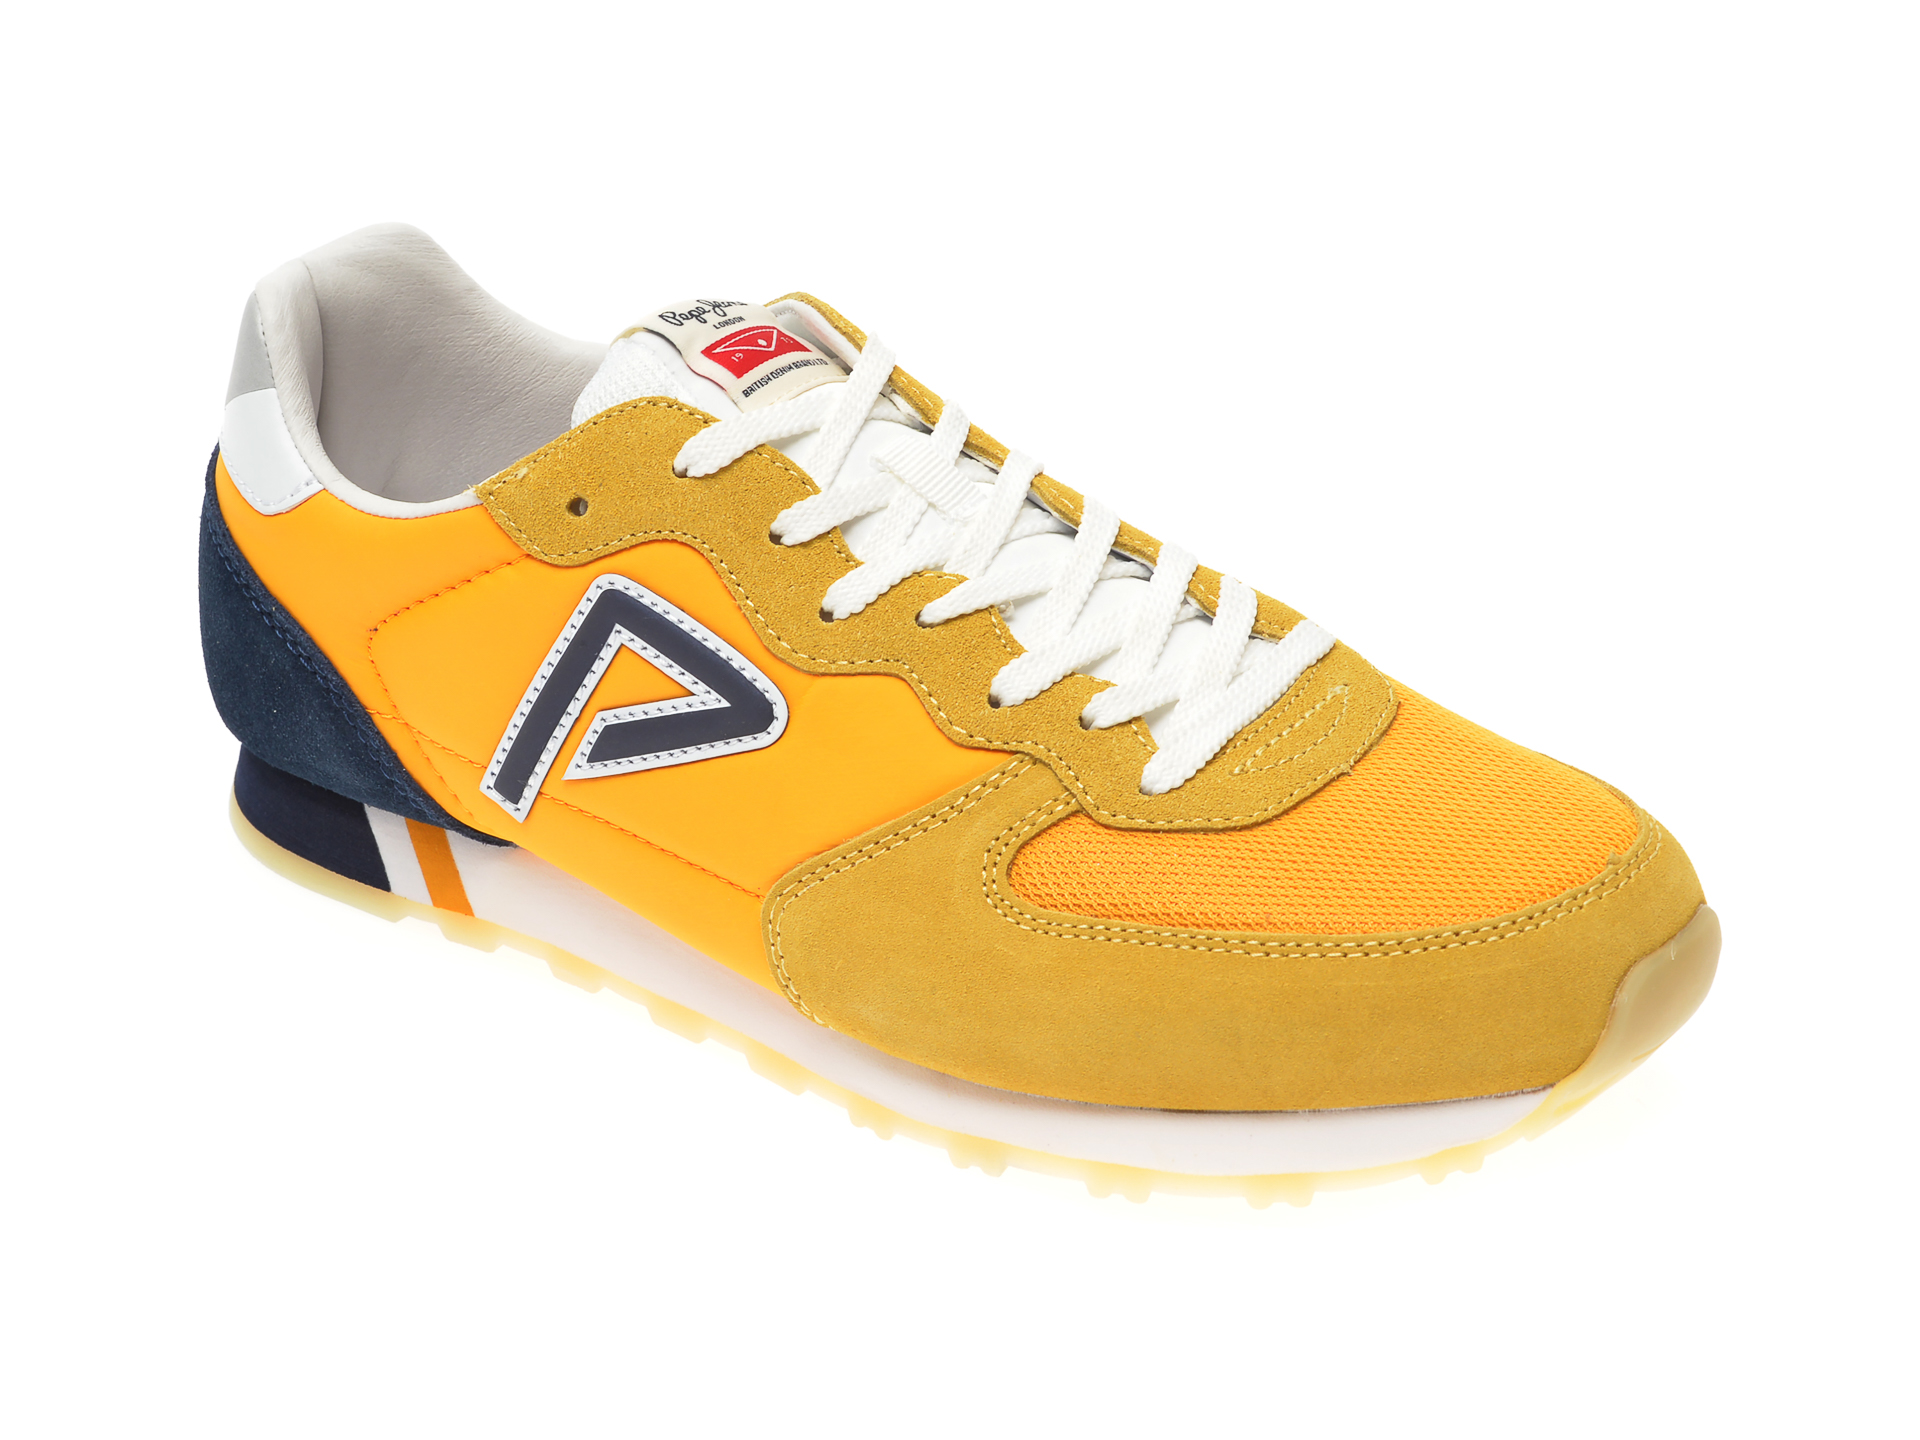 Pantofi sport PEPE JEANS galbeni MS30610, din material textil si piele intoarsa imagine